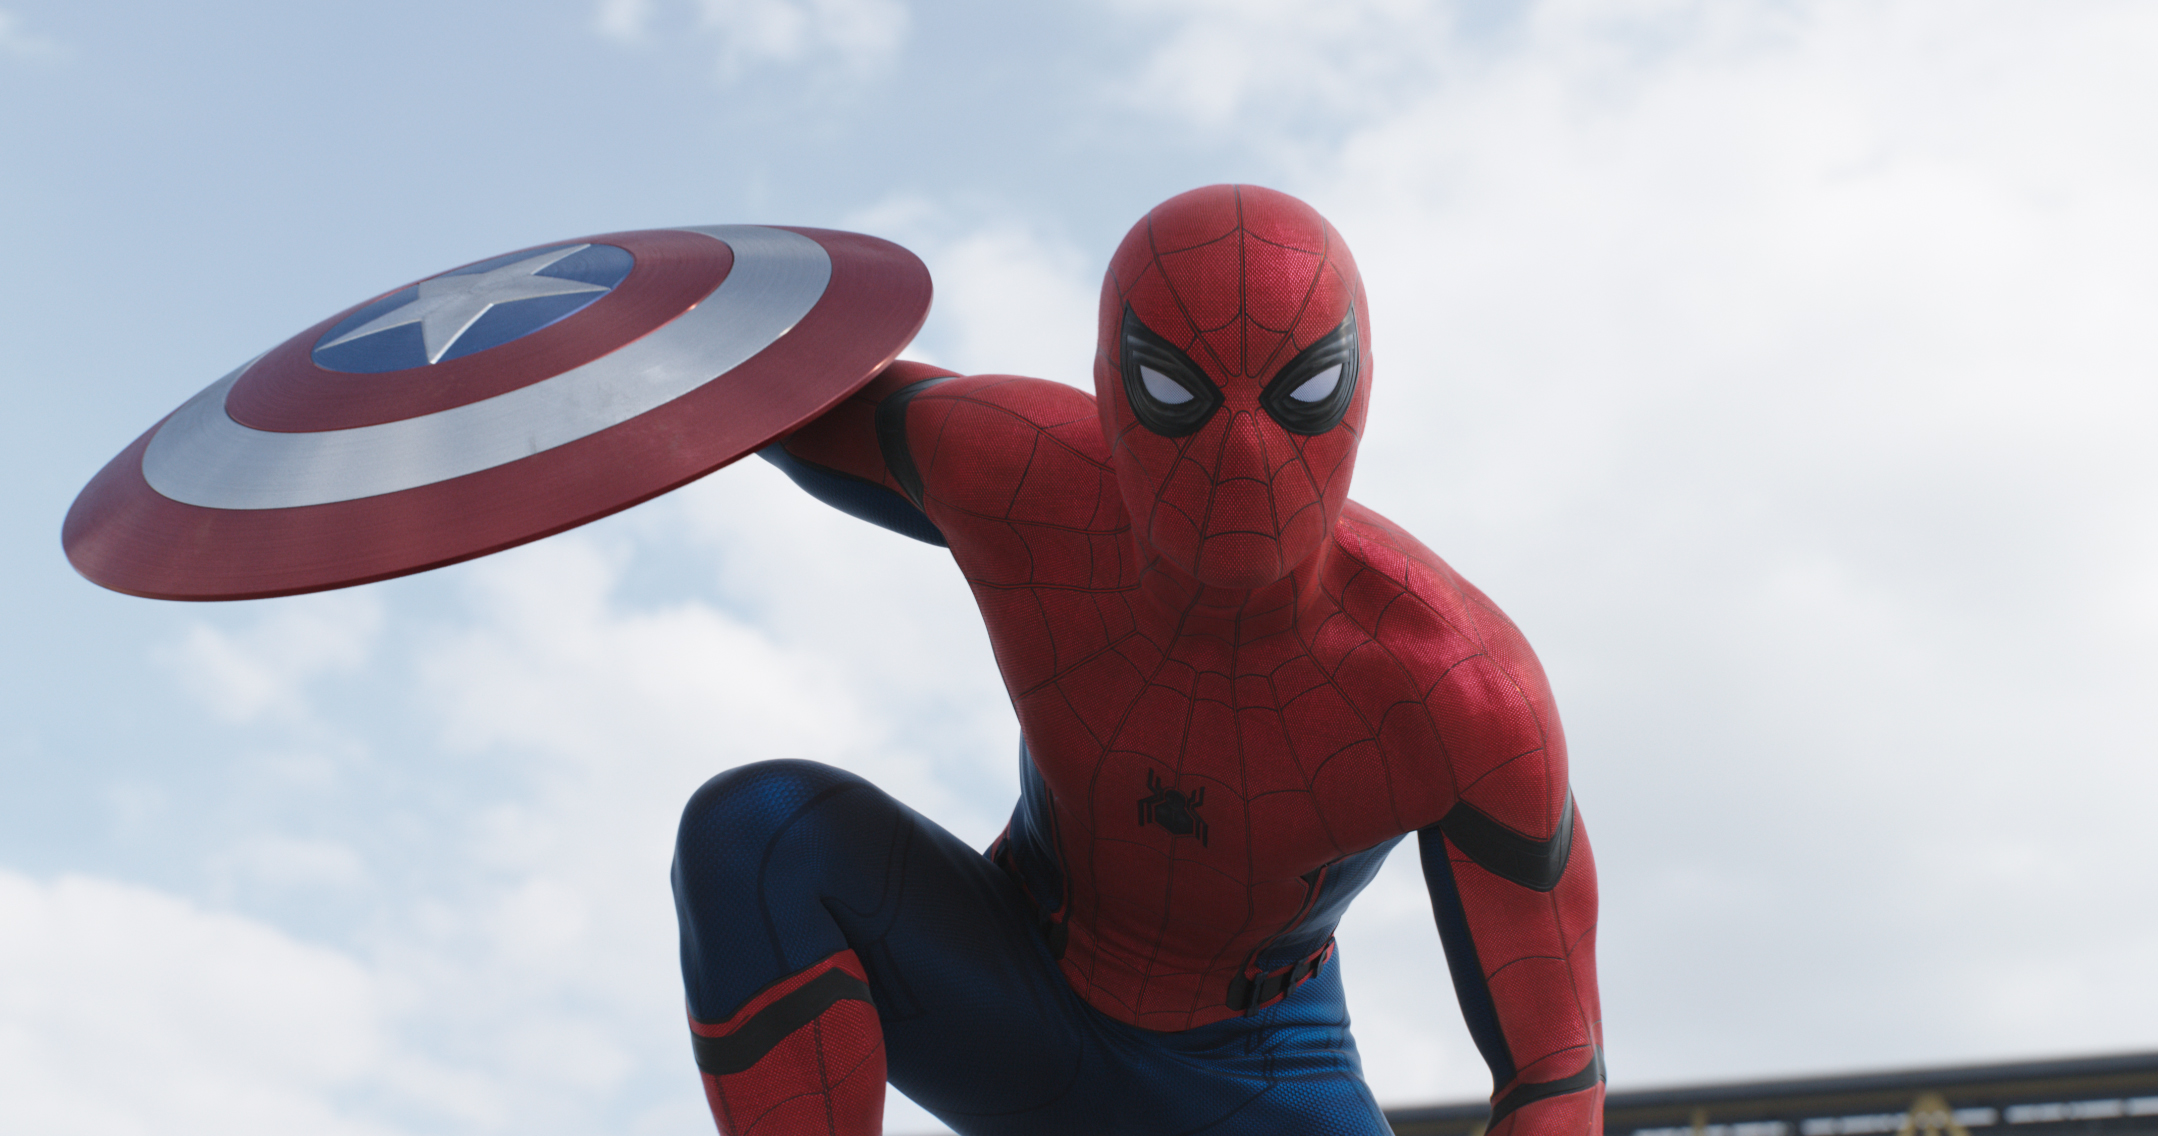 spiderman captain america.jpg